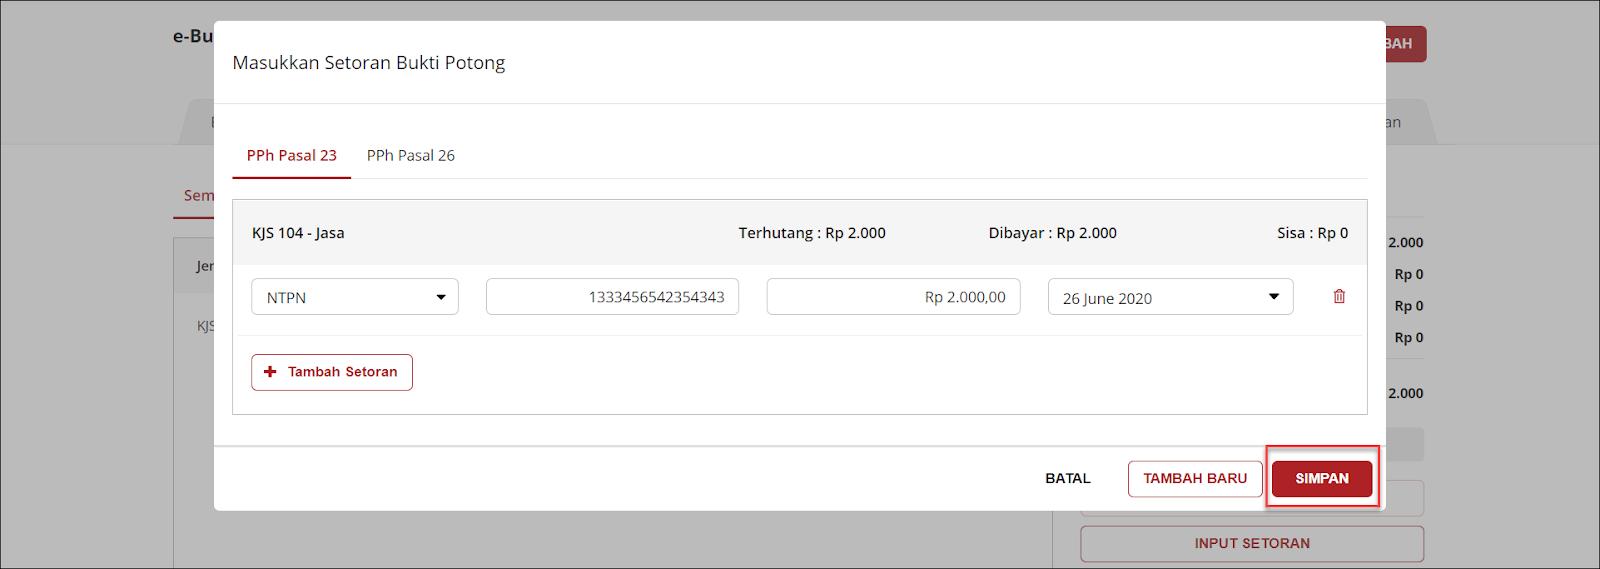 Tampilan ketika menyimpan data Setoran Bukti Potong pada e-Bukti Potong PPh 23/26 OnlinePajak Image